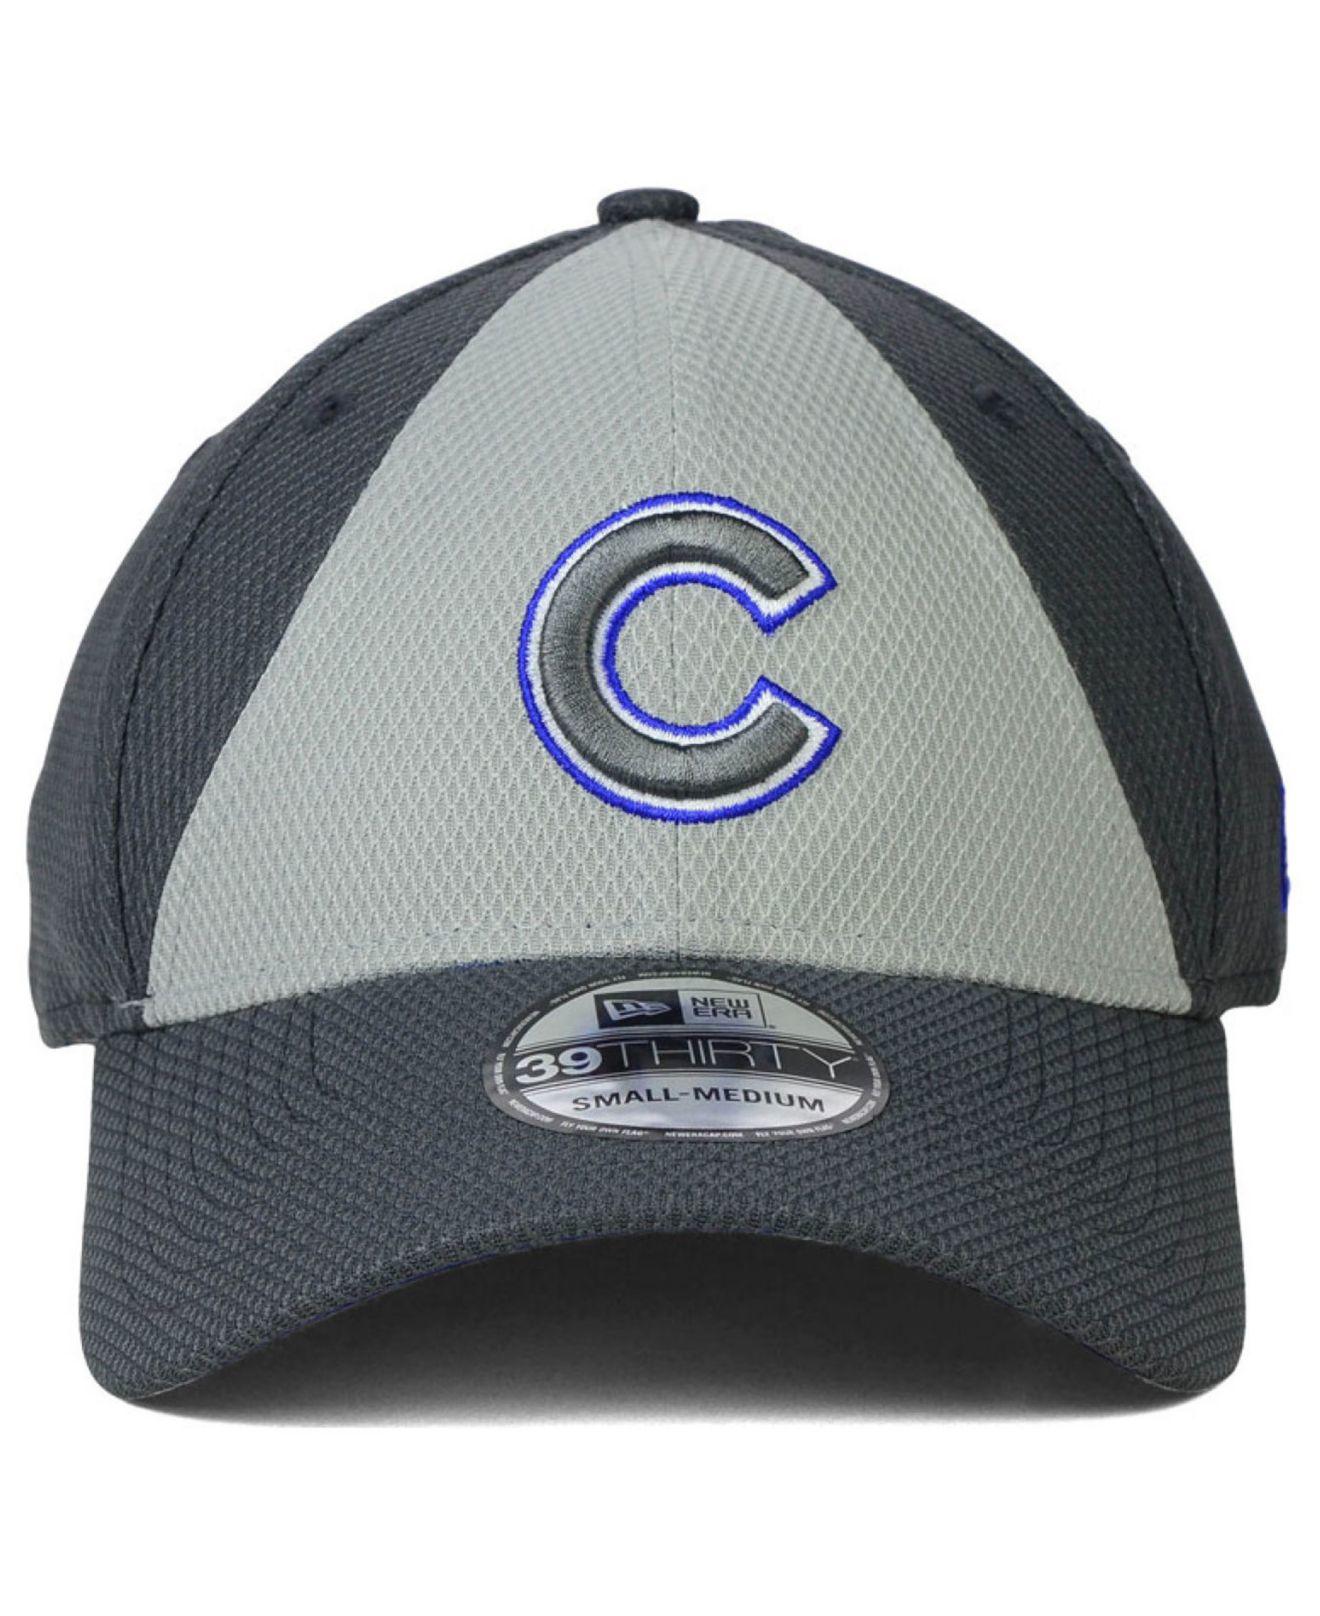 Lyst - Ktz Chicago Cubs Diamond Era Double Play 39thirty Cap in Gray ... 2ed20db23b07